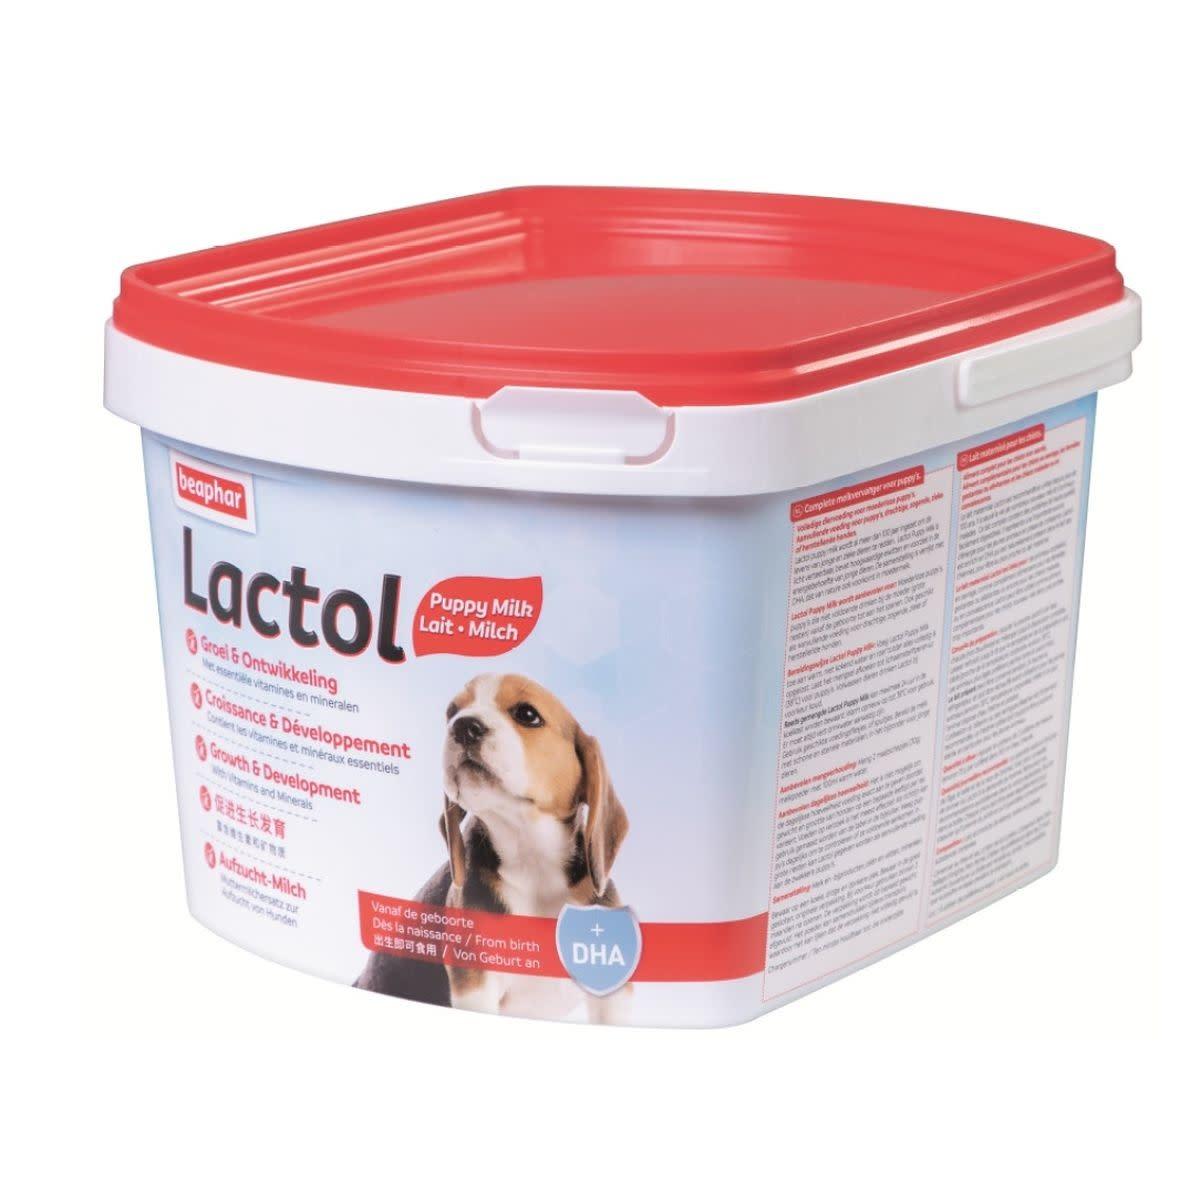 Beaphar Beaphar lactol pup